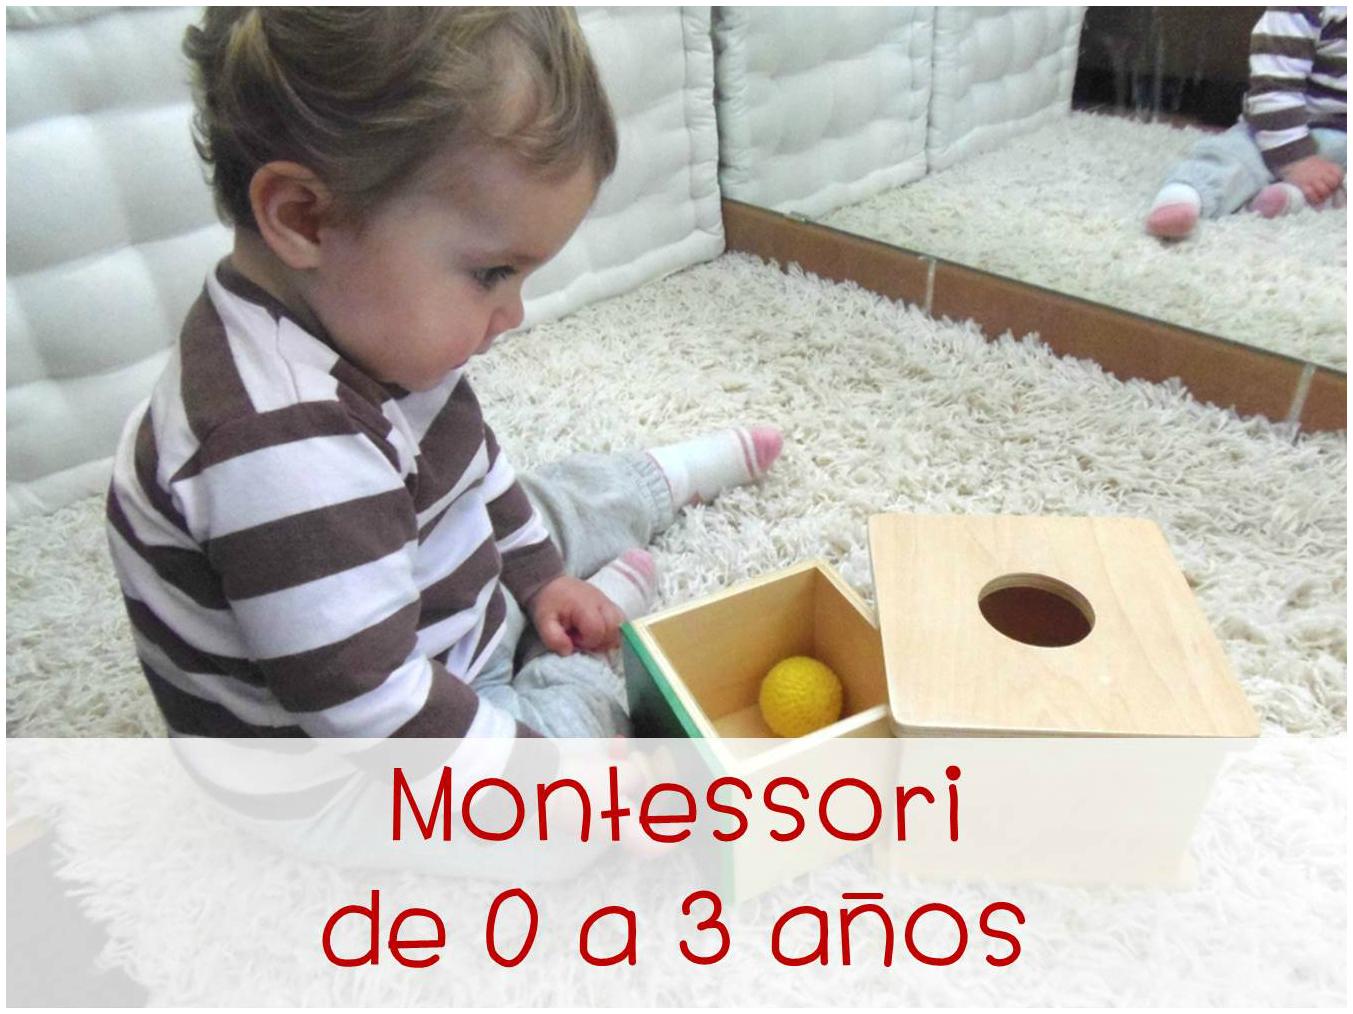 Montessori de 0 a 3 años